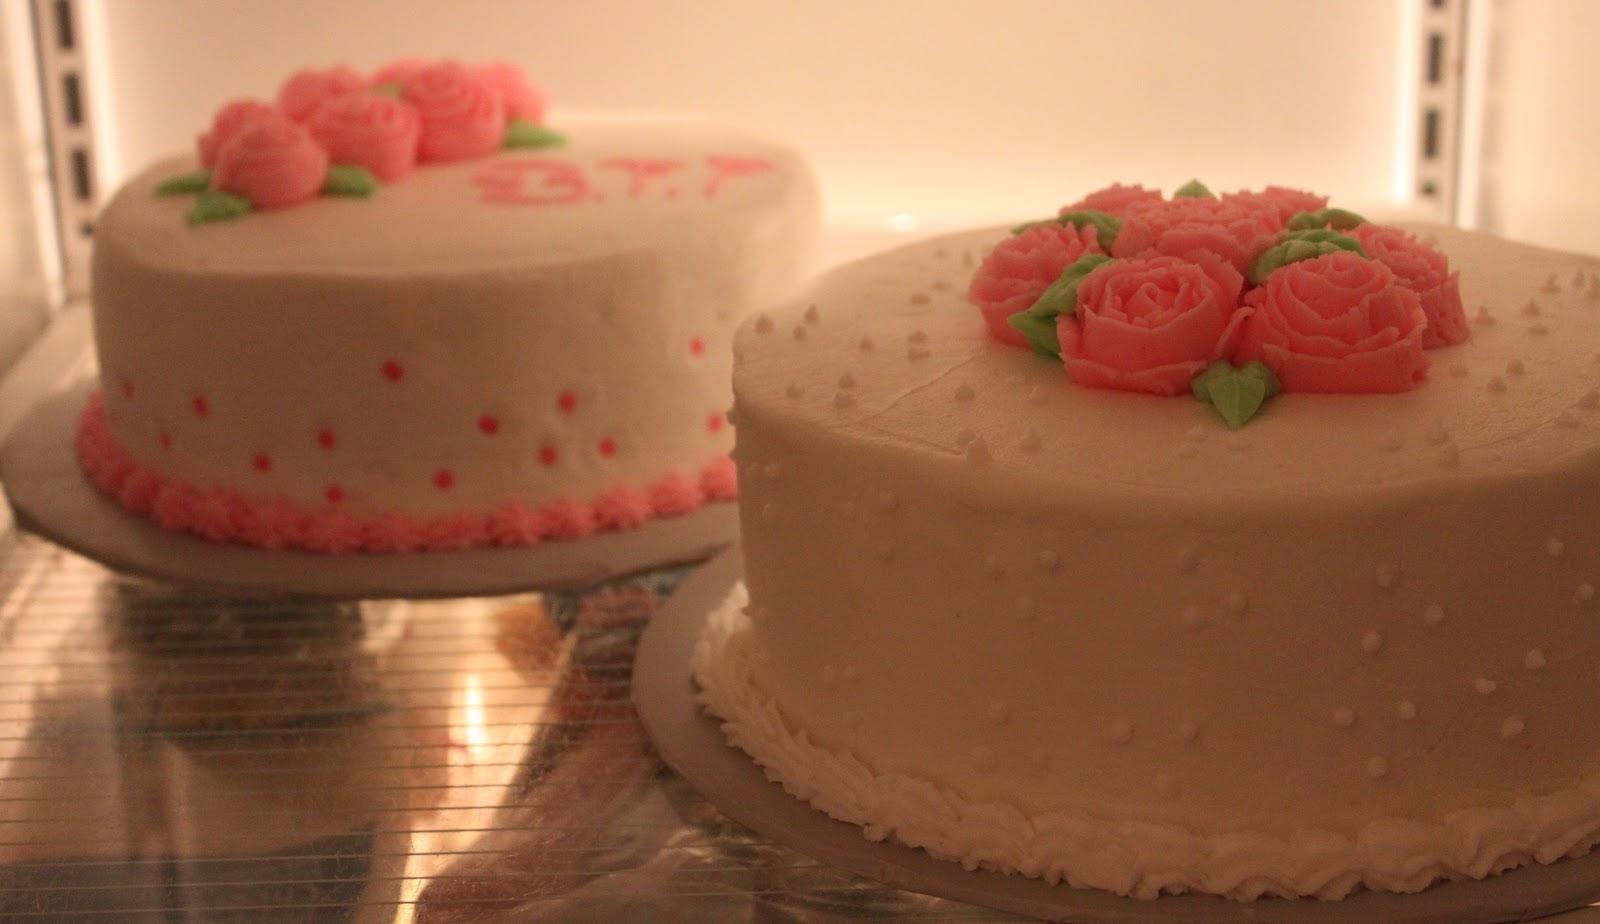 Cake Decor Course : Aunt B s Cookin : Lesson 4 Course 1 - Wilton Cake Decorating Class